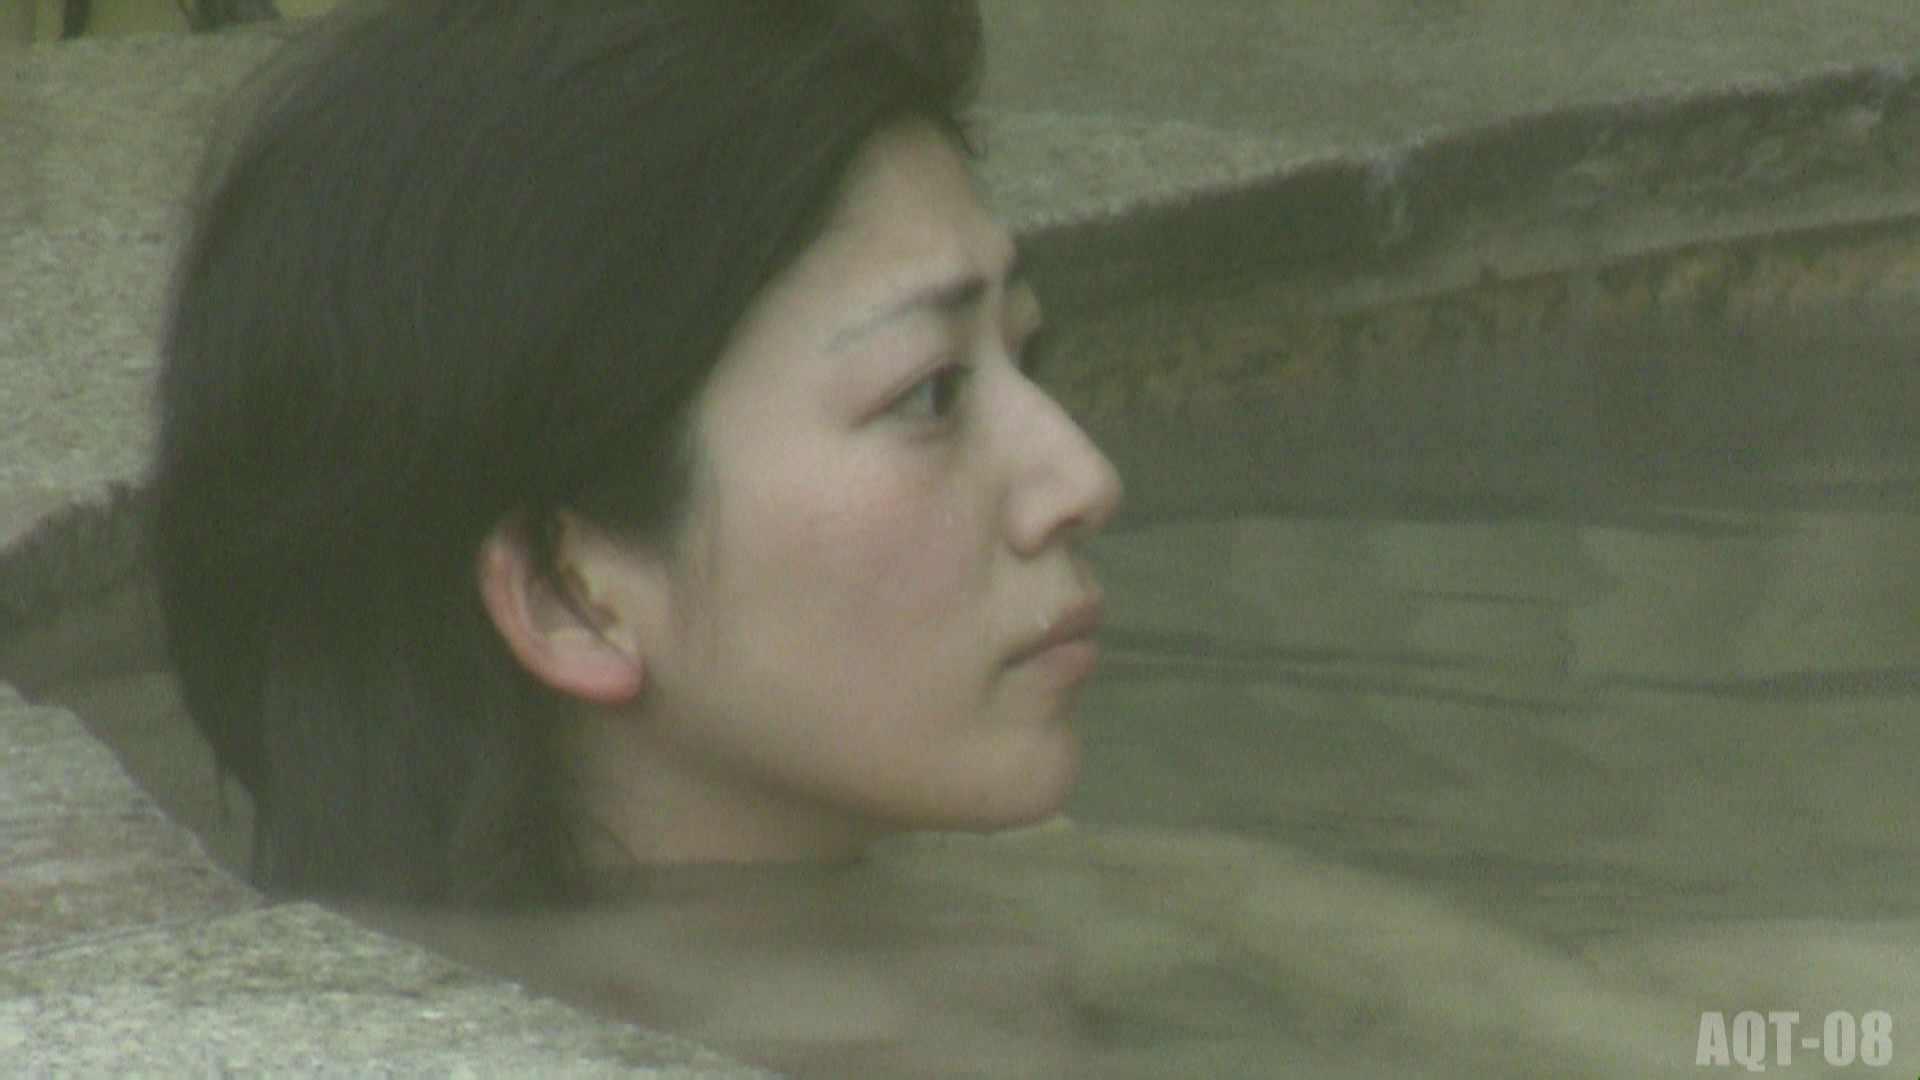 Aquaな露天風呂Vol.776 盗撮 | HなOL  60pic 20